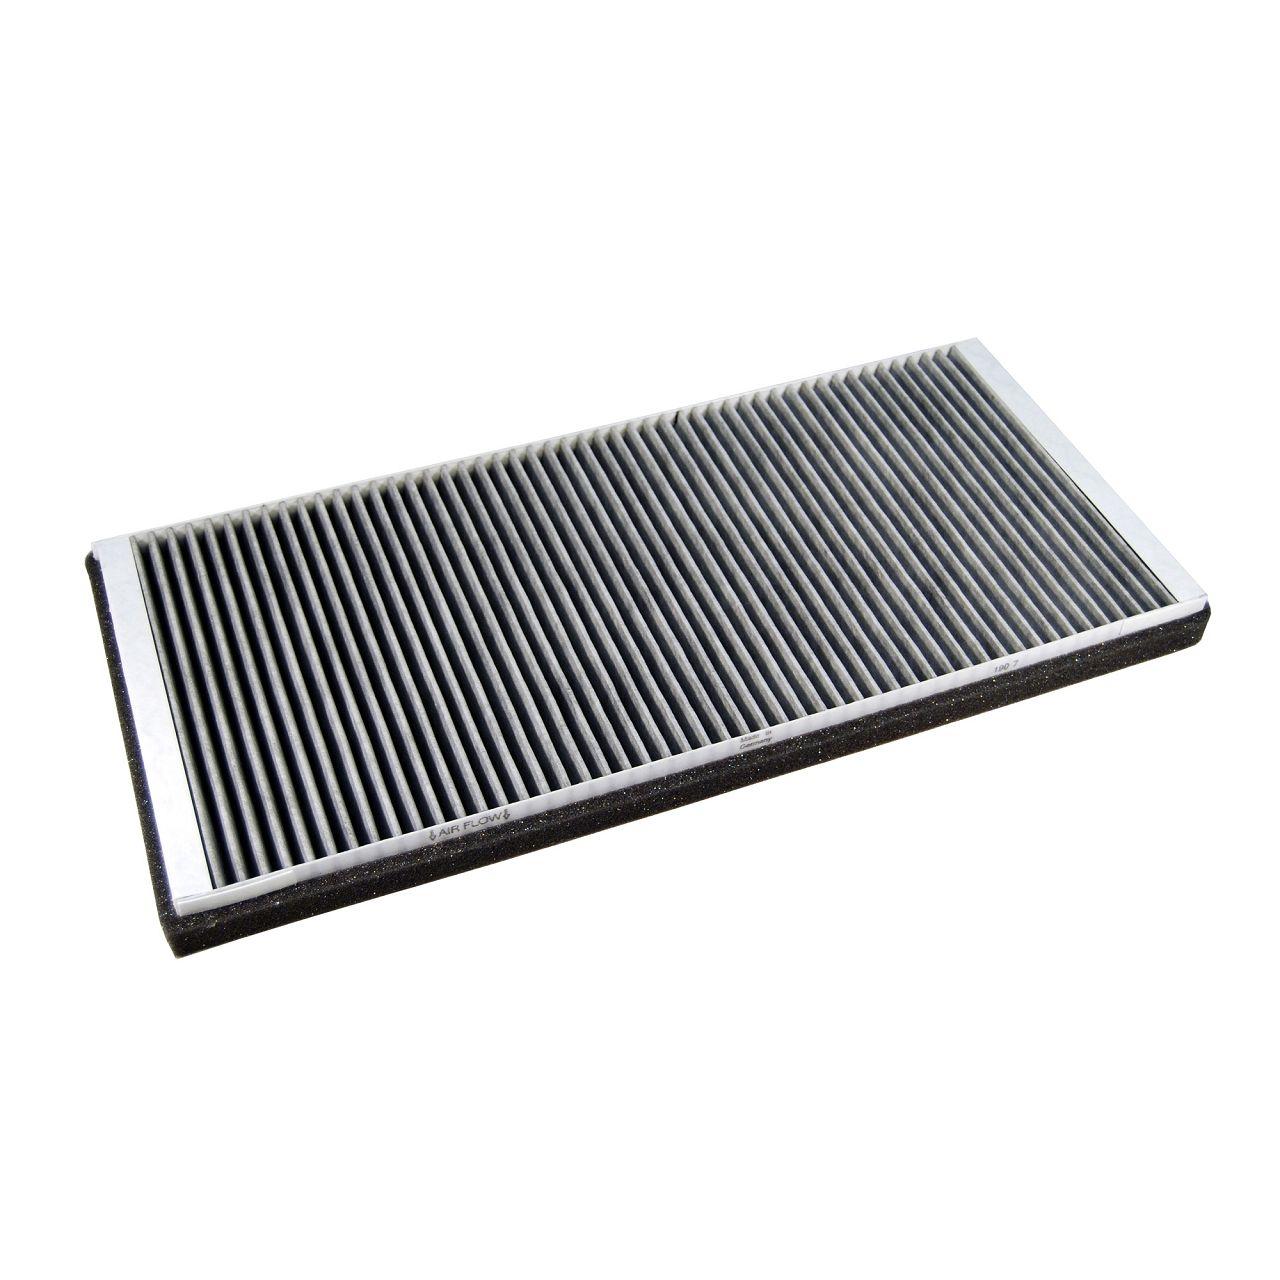 Inspektionskit Filterpaket Filterset für BMW X5 E53 4.4i 4.6is 286/347 PS